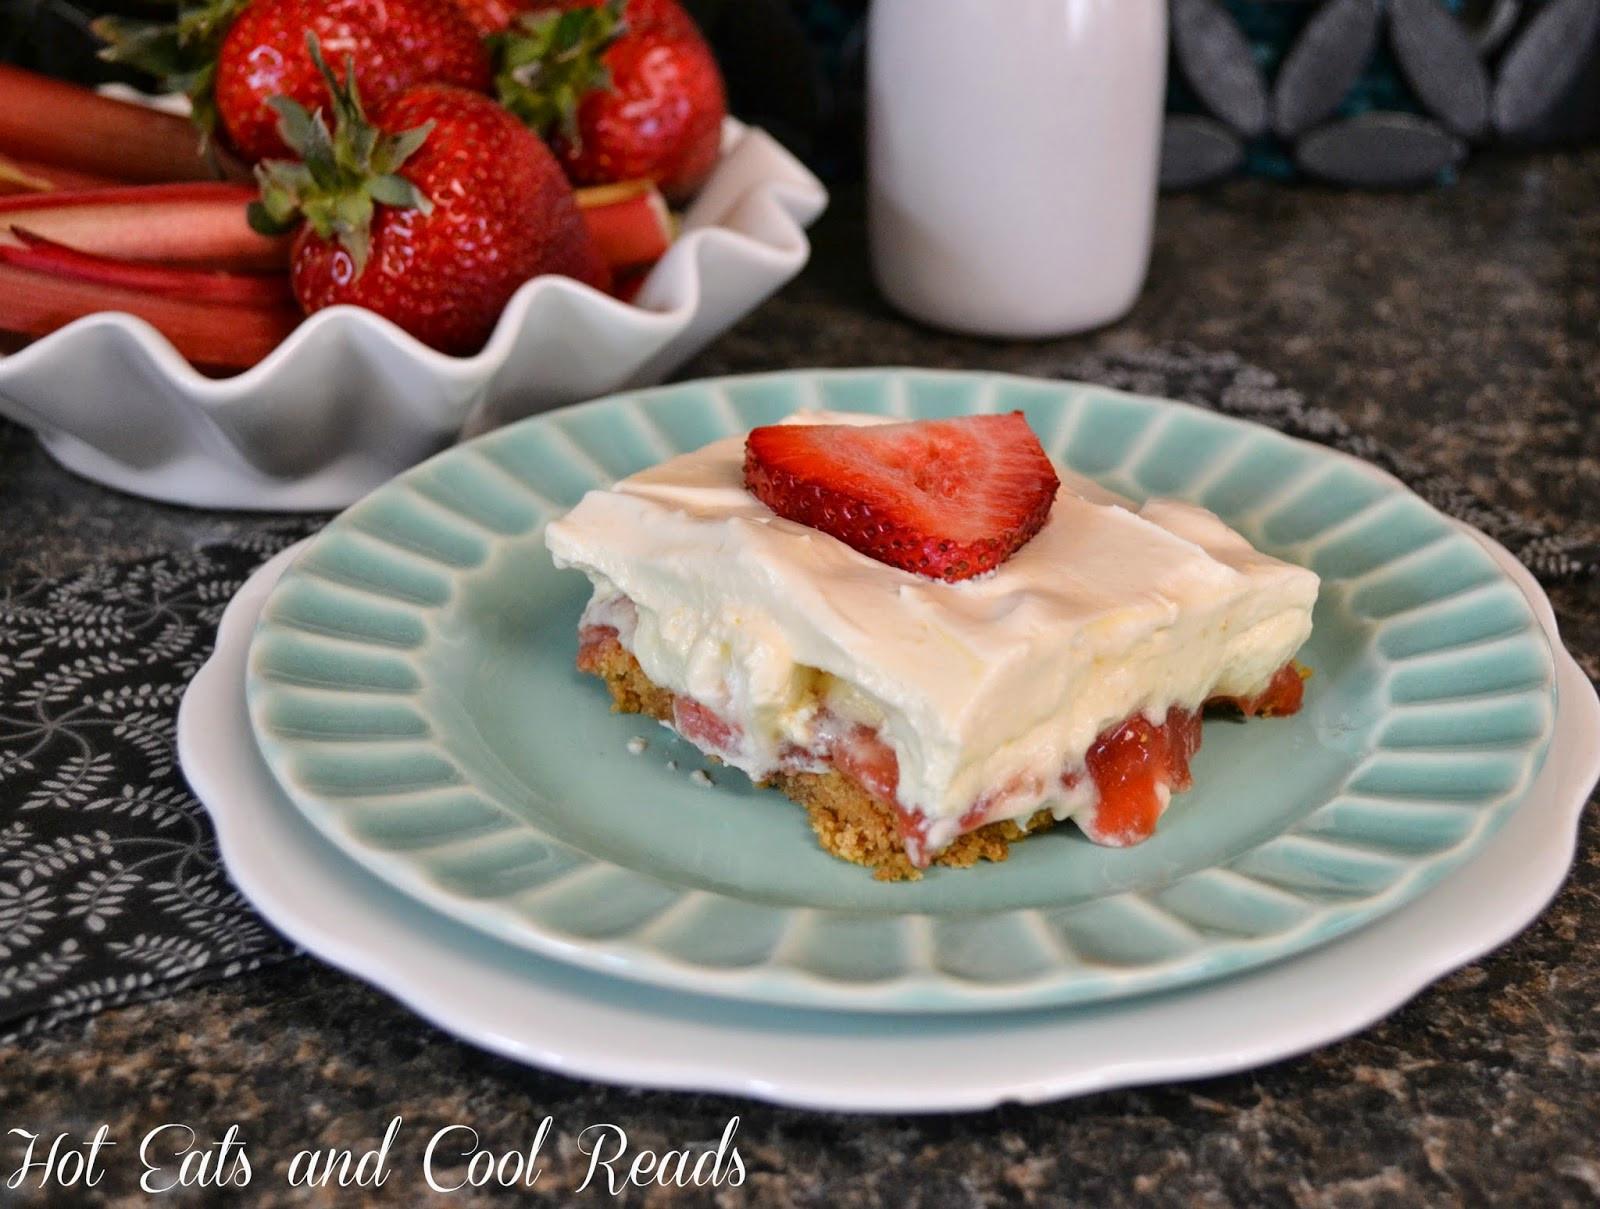 Rhubarb Dessert Recipes  Hot Eats and Cool Reads Luscious Strawberry Rhubarb